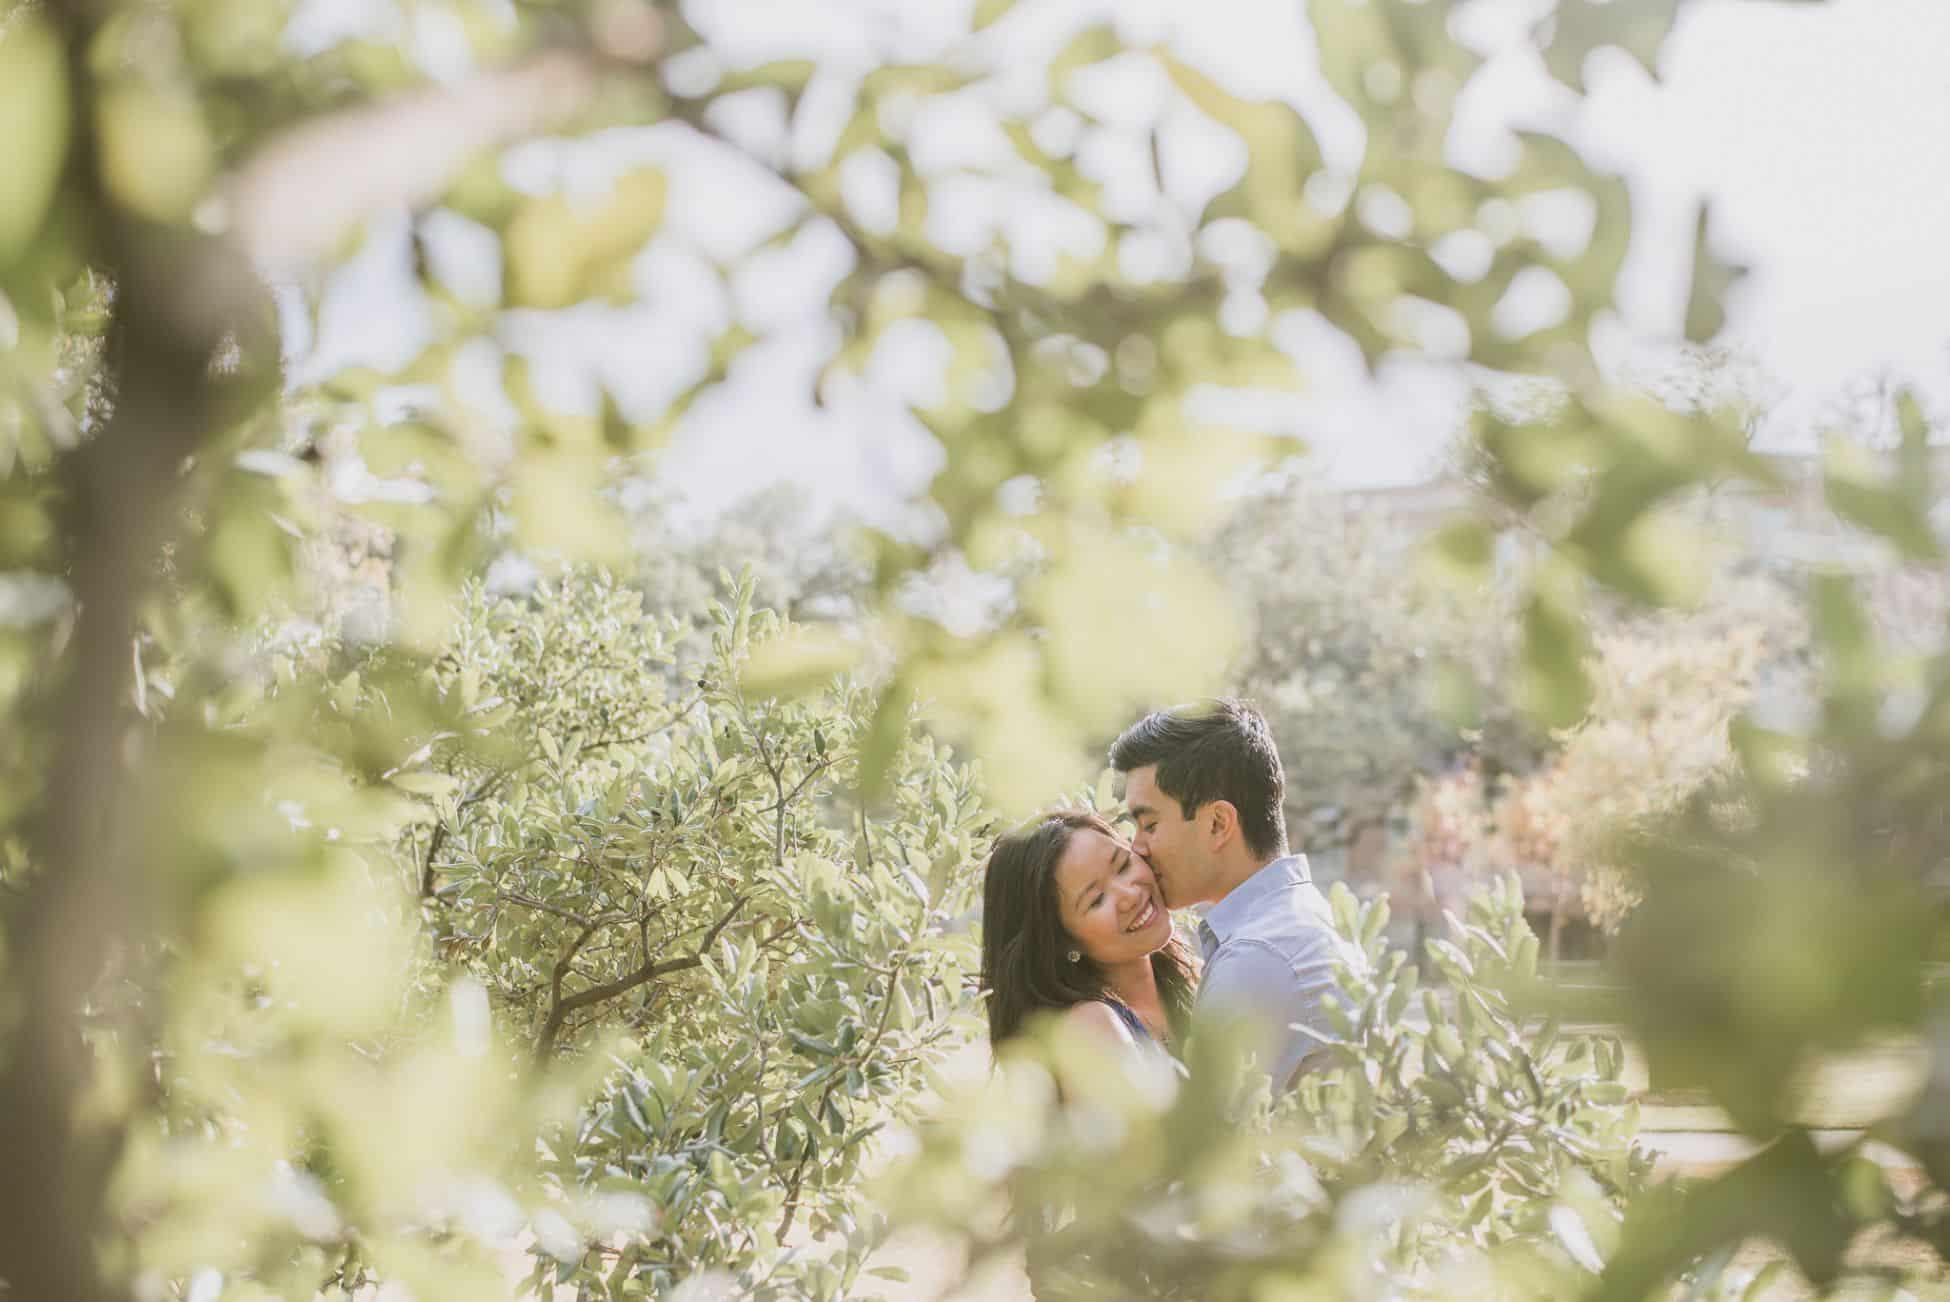 Best 2015 Wedding Photography Austin-10